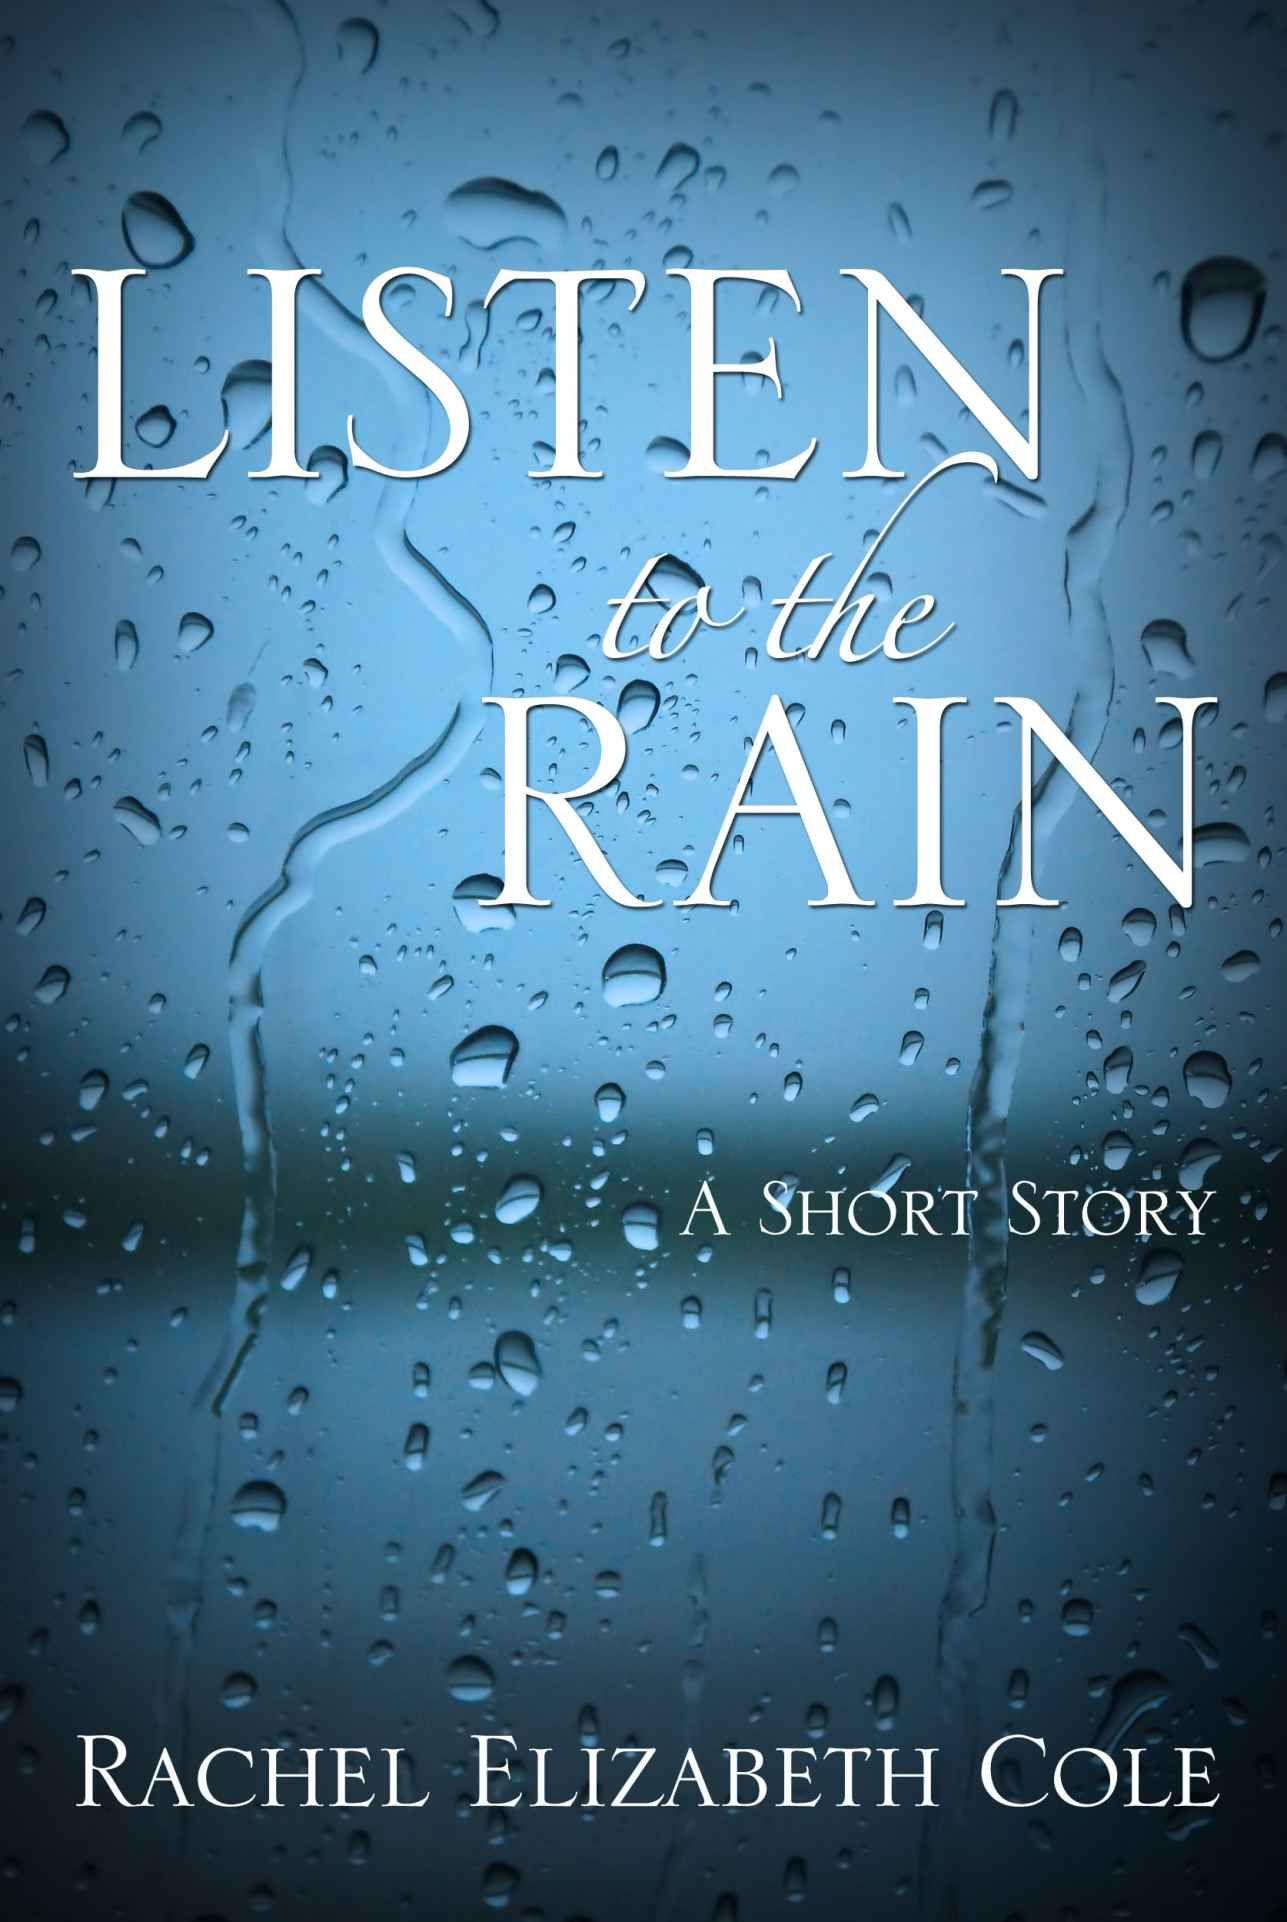 Amazon com: Listen to the Rain: A Short Story eBook: Rachel